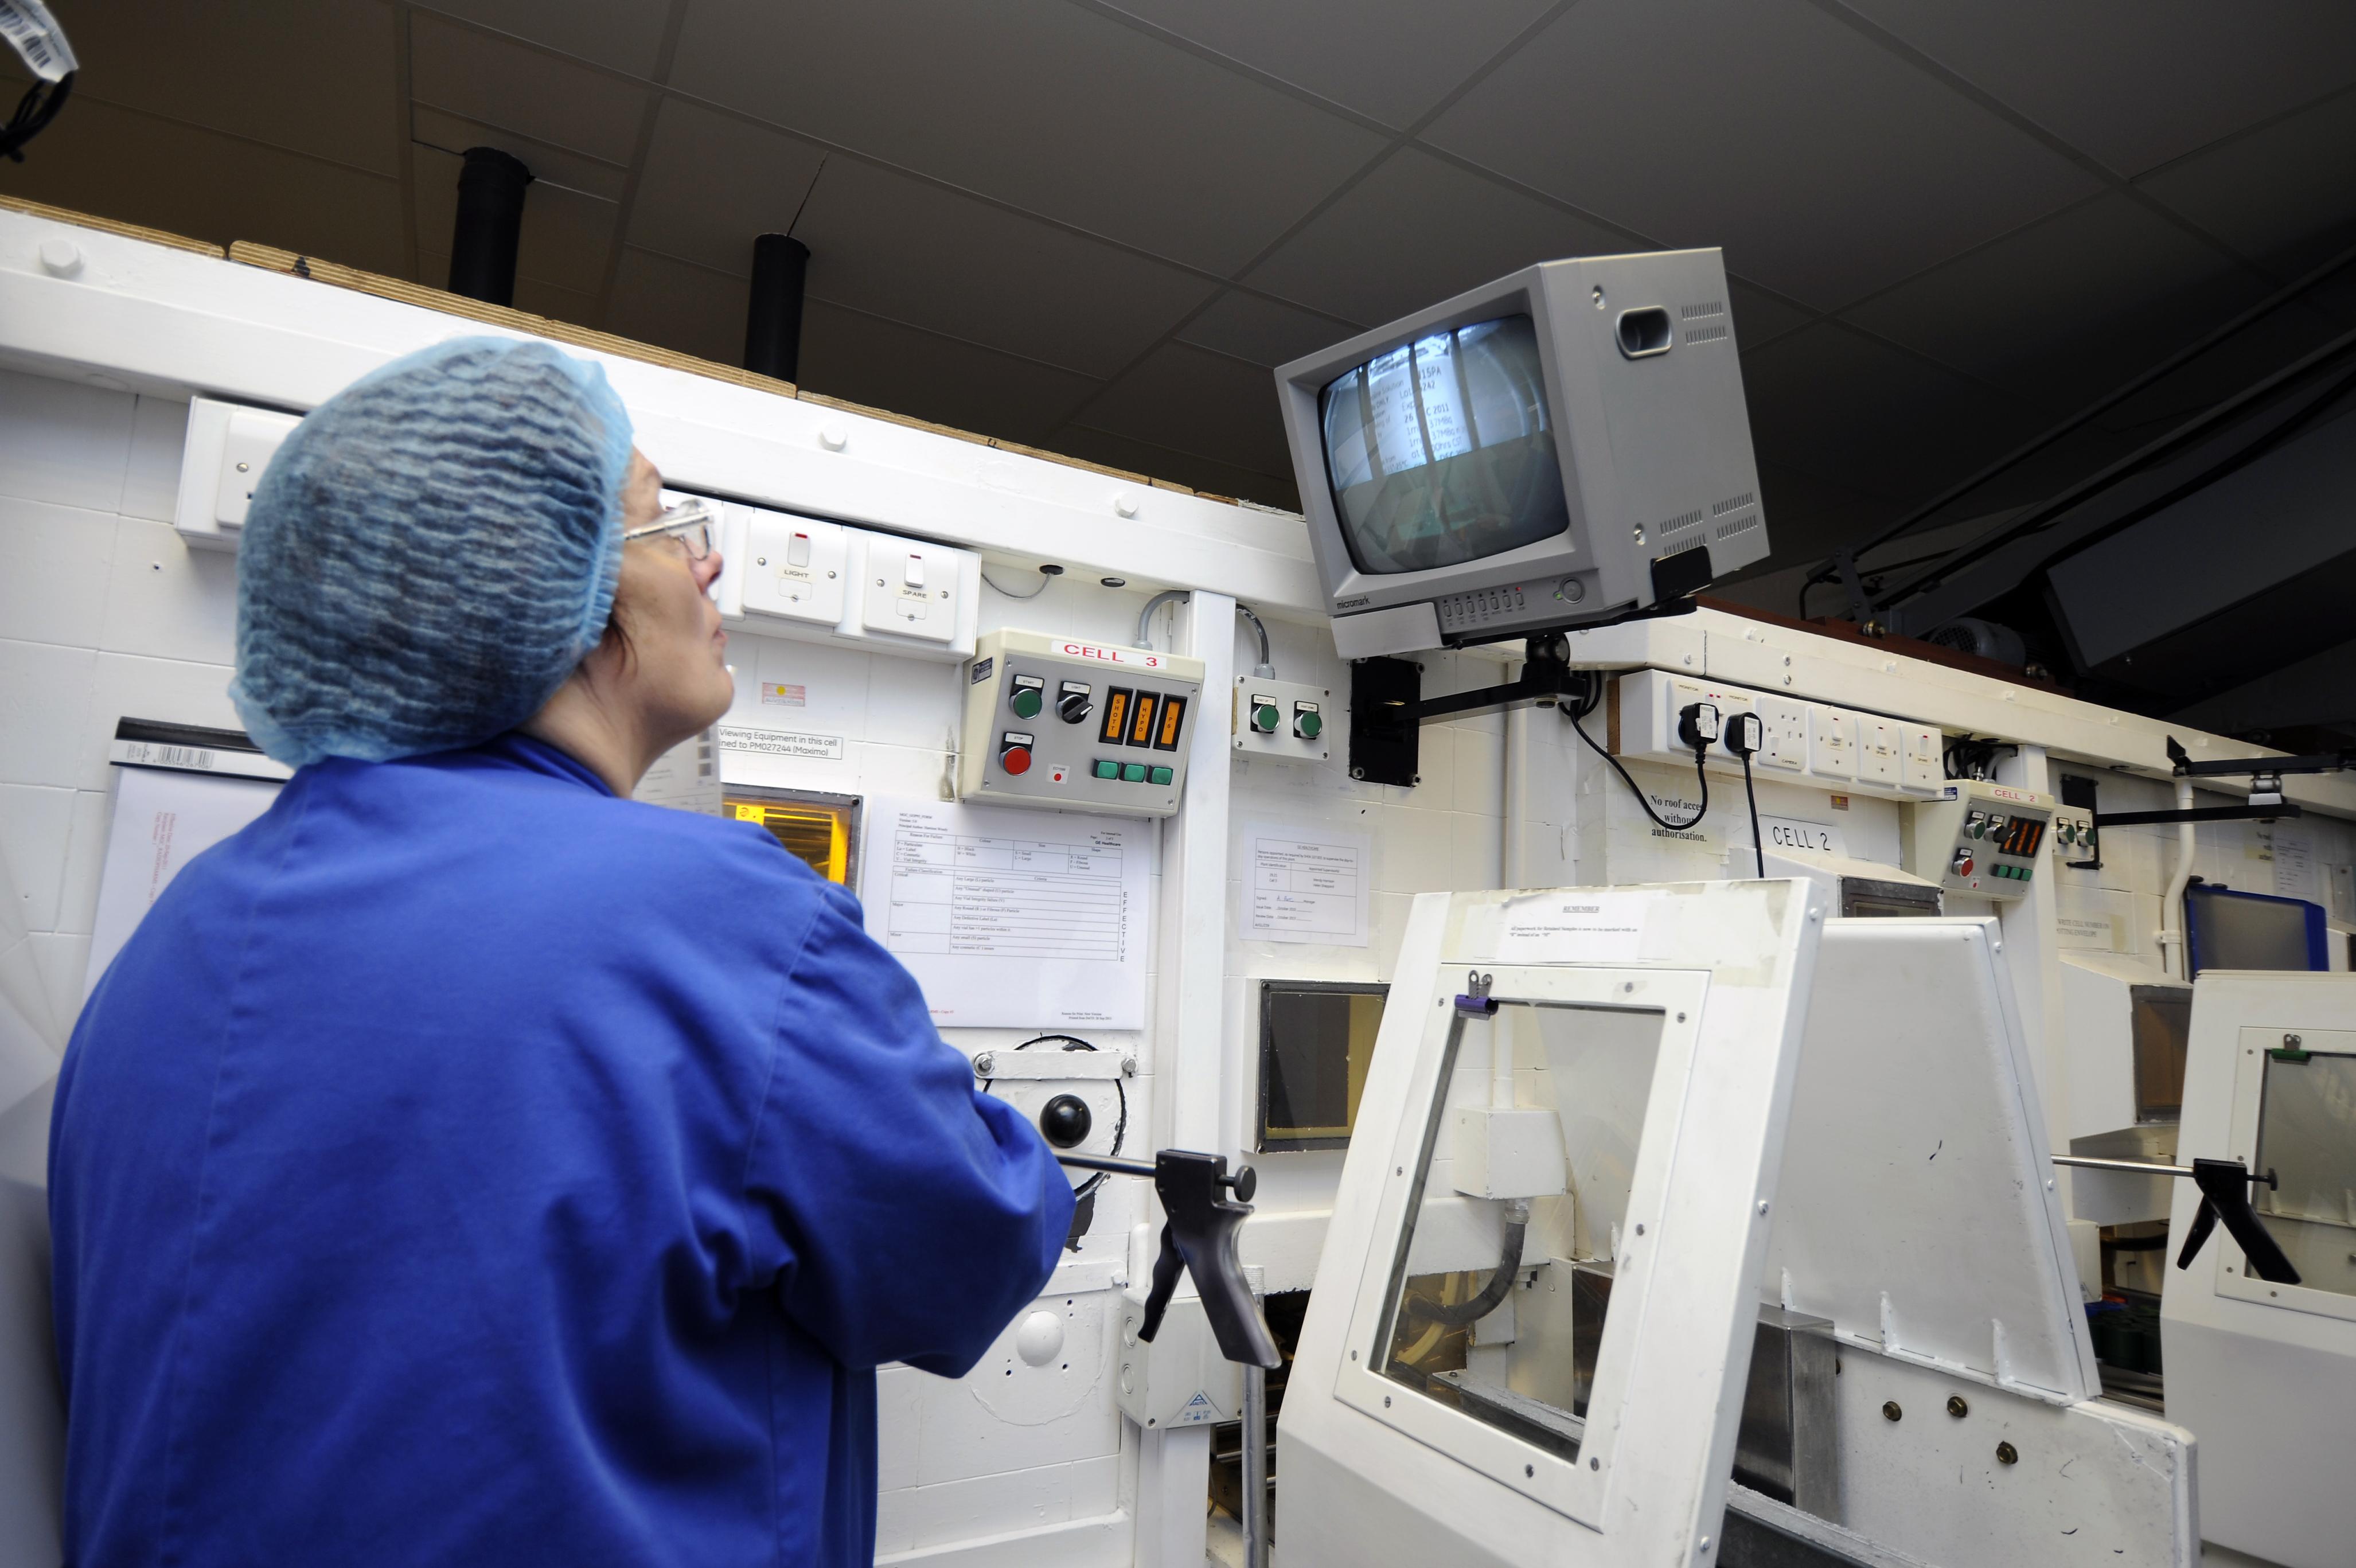 File:Packaging radiopharmaceuticals GE Healthcare 12.jpg - Wikimedia Commons